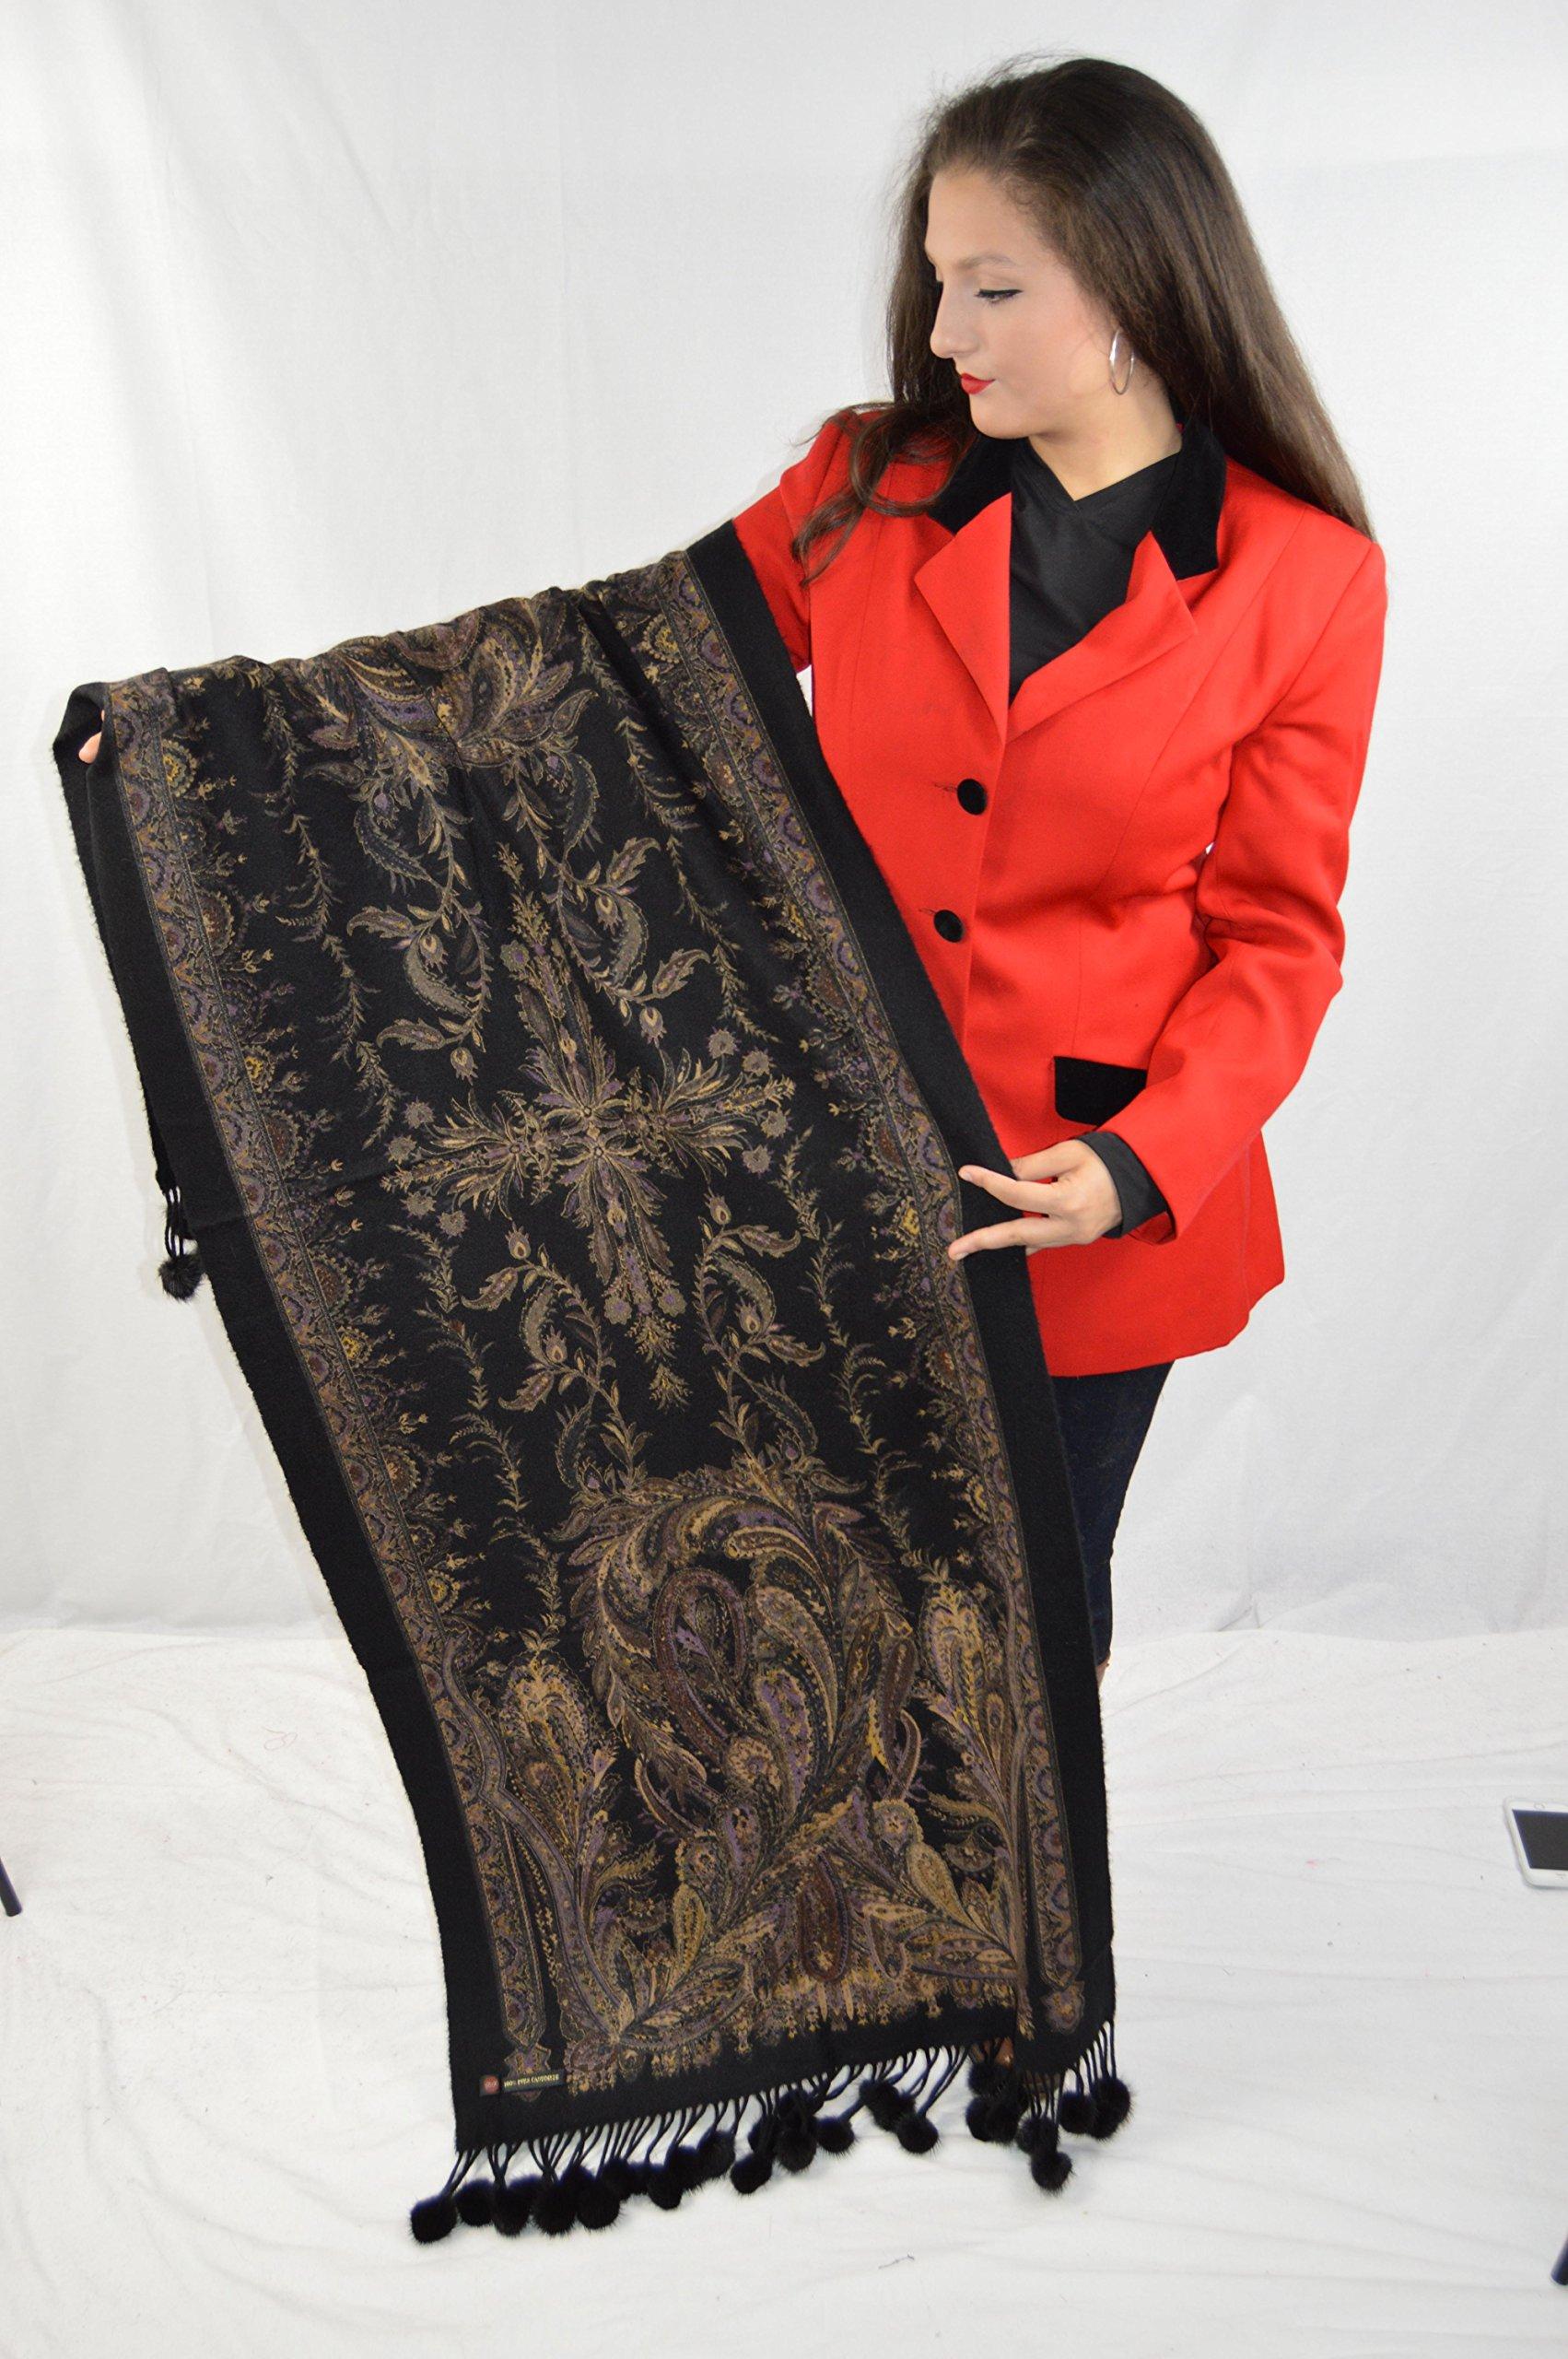 Cashmere Pashmina Group-Cashmere Shawl Scarf Wrap Stole (Solid/ Reversible Print w/ Genuine Fur) - Mink Black by Cashmere Pashmina Group (Image #4)